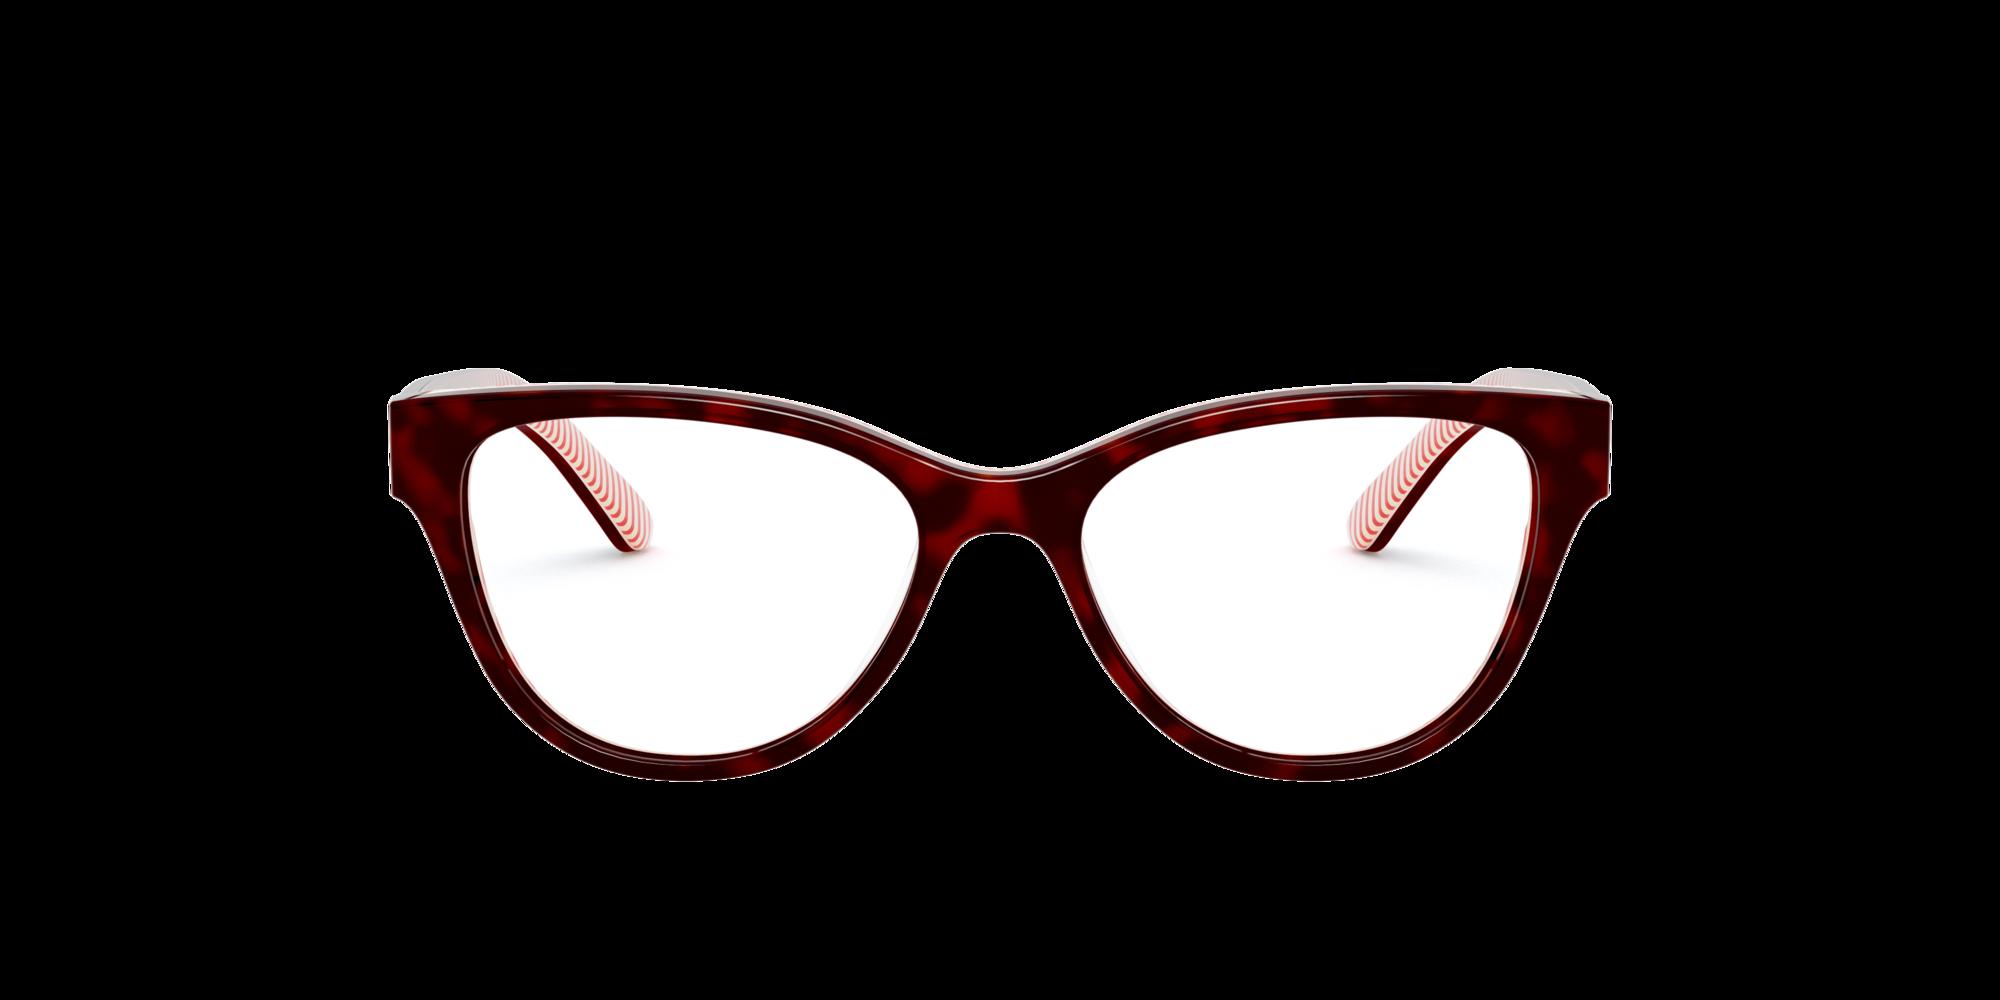 Image for PP8539 from LensCrafters   Glasses, Prescription Glasses Online, Eyewear